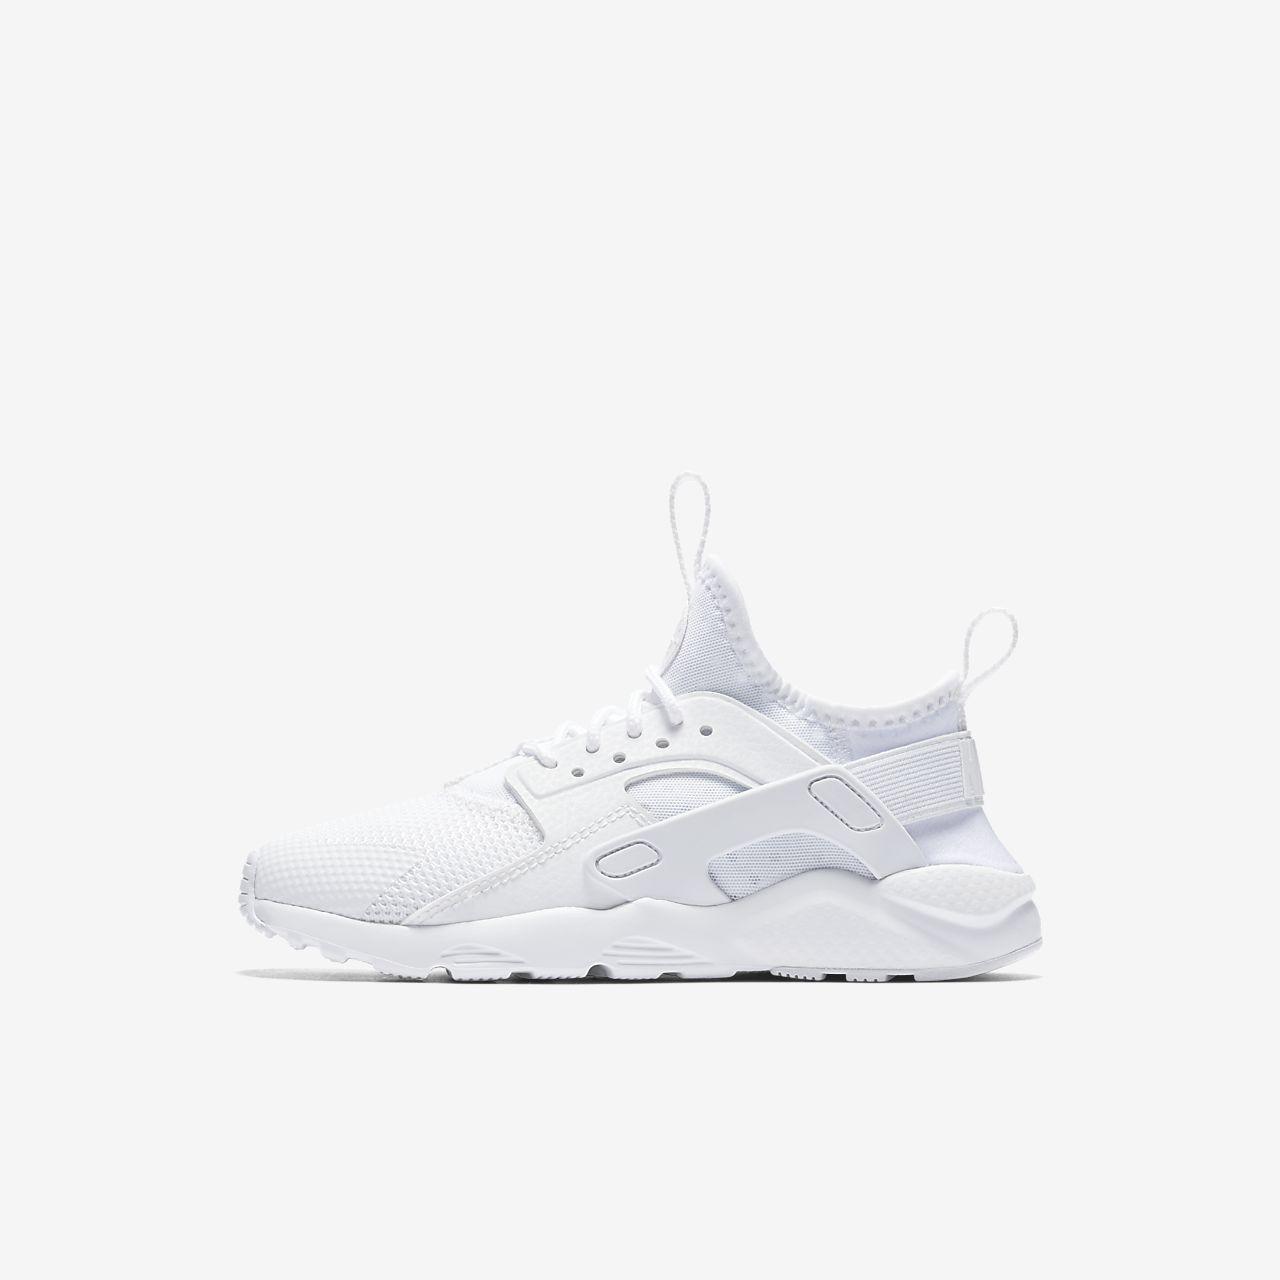 29a3a0812b7a Nike Huarache Ultra - sko til små børn. Nike.com DK